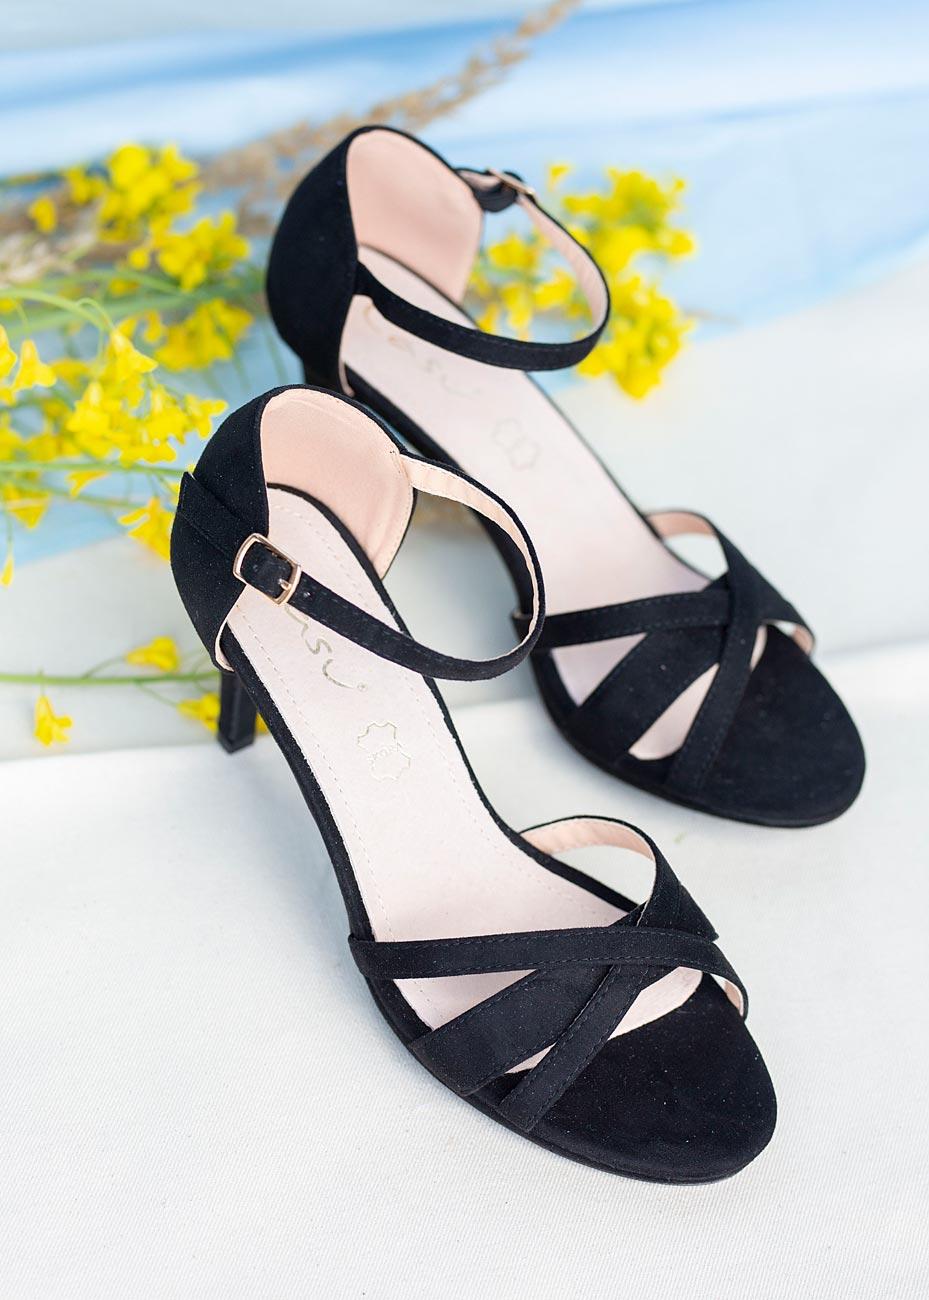 Czarne sandały szpilki z zakrytą piętą ze skórzaną wkładką Casu ER20X3/B czarny